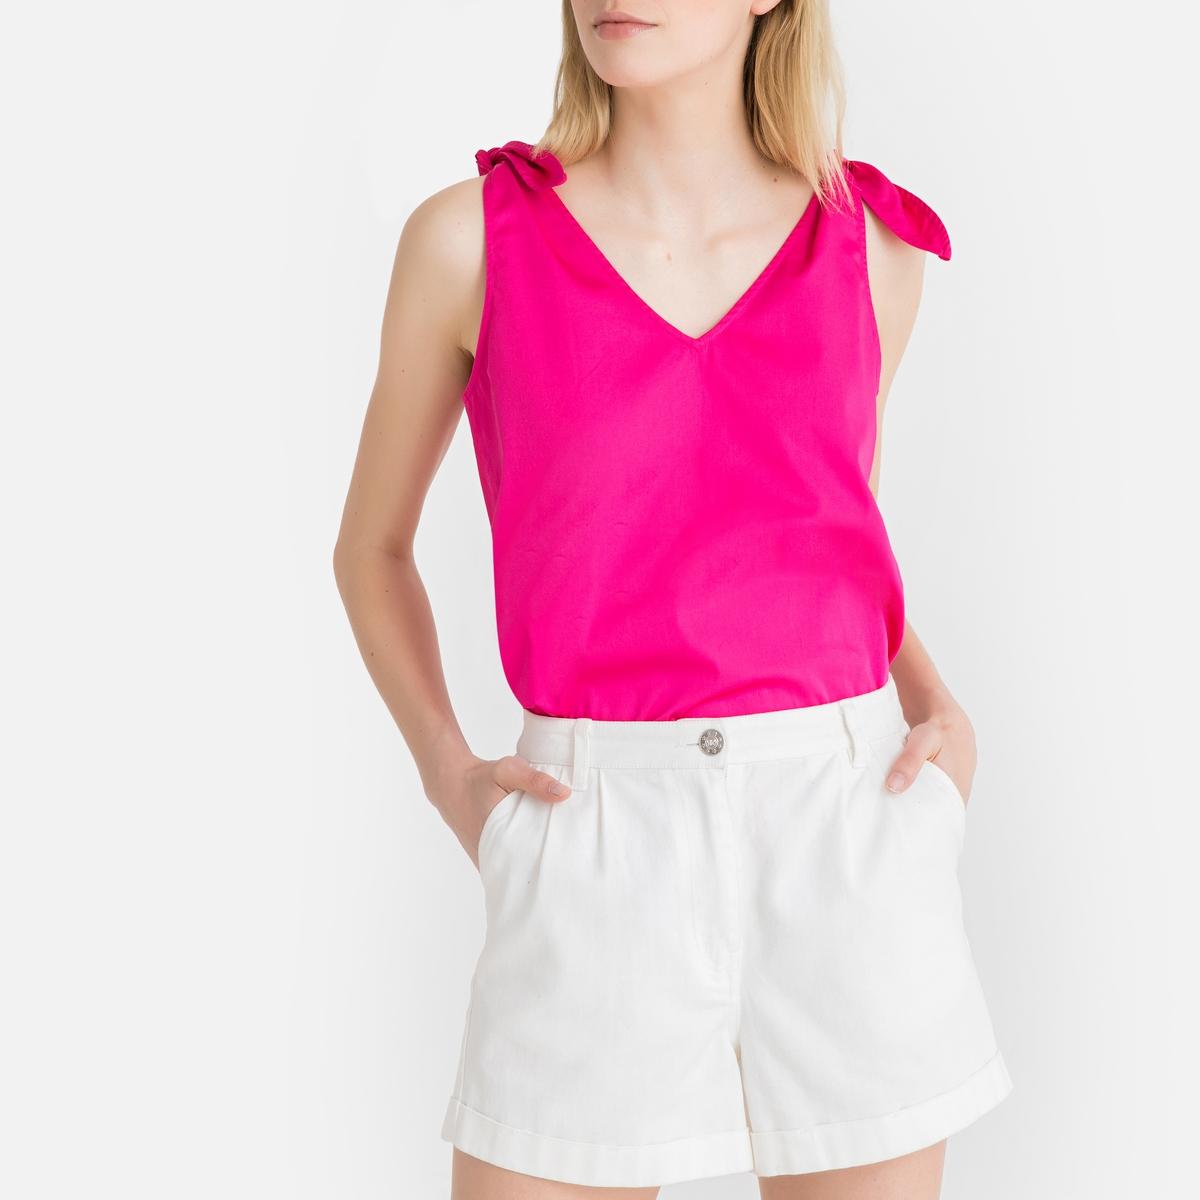 Блузка La Redoute Без рукавов с завязками на плечах 34 (FR) - 40 (RUS) розовый блузка lime блузка с завязками